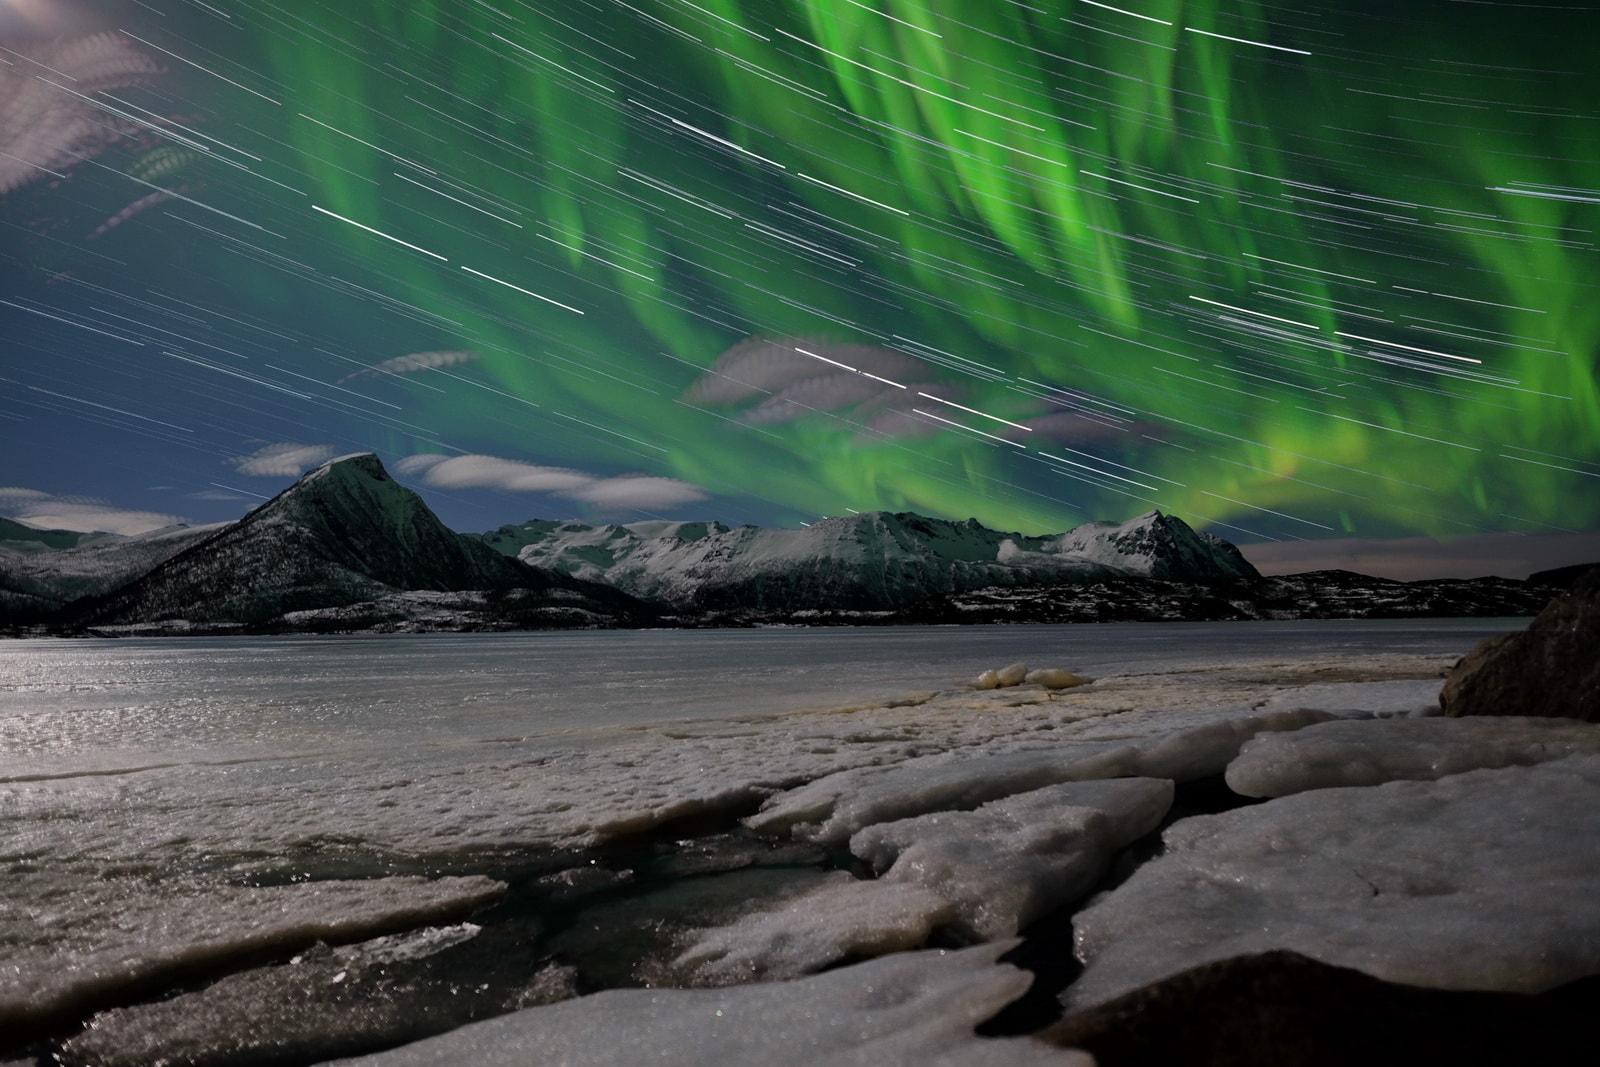 Aurora boreale in Norvegia - foto di Luca Bracali